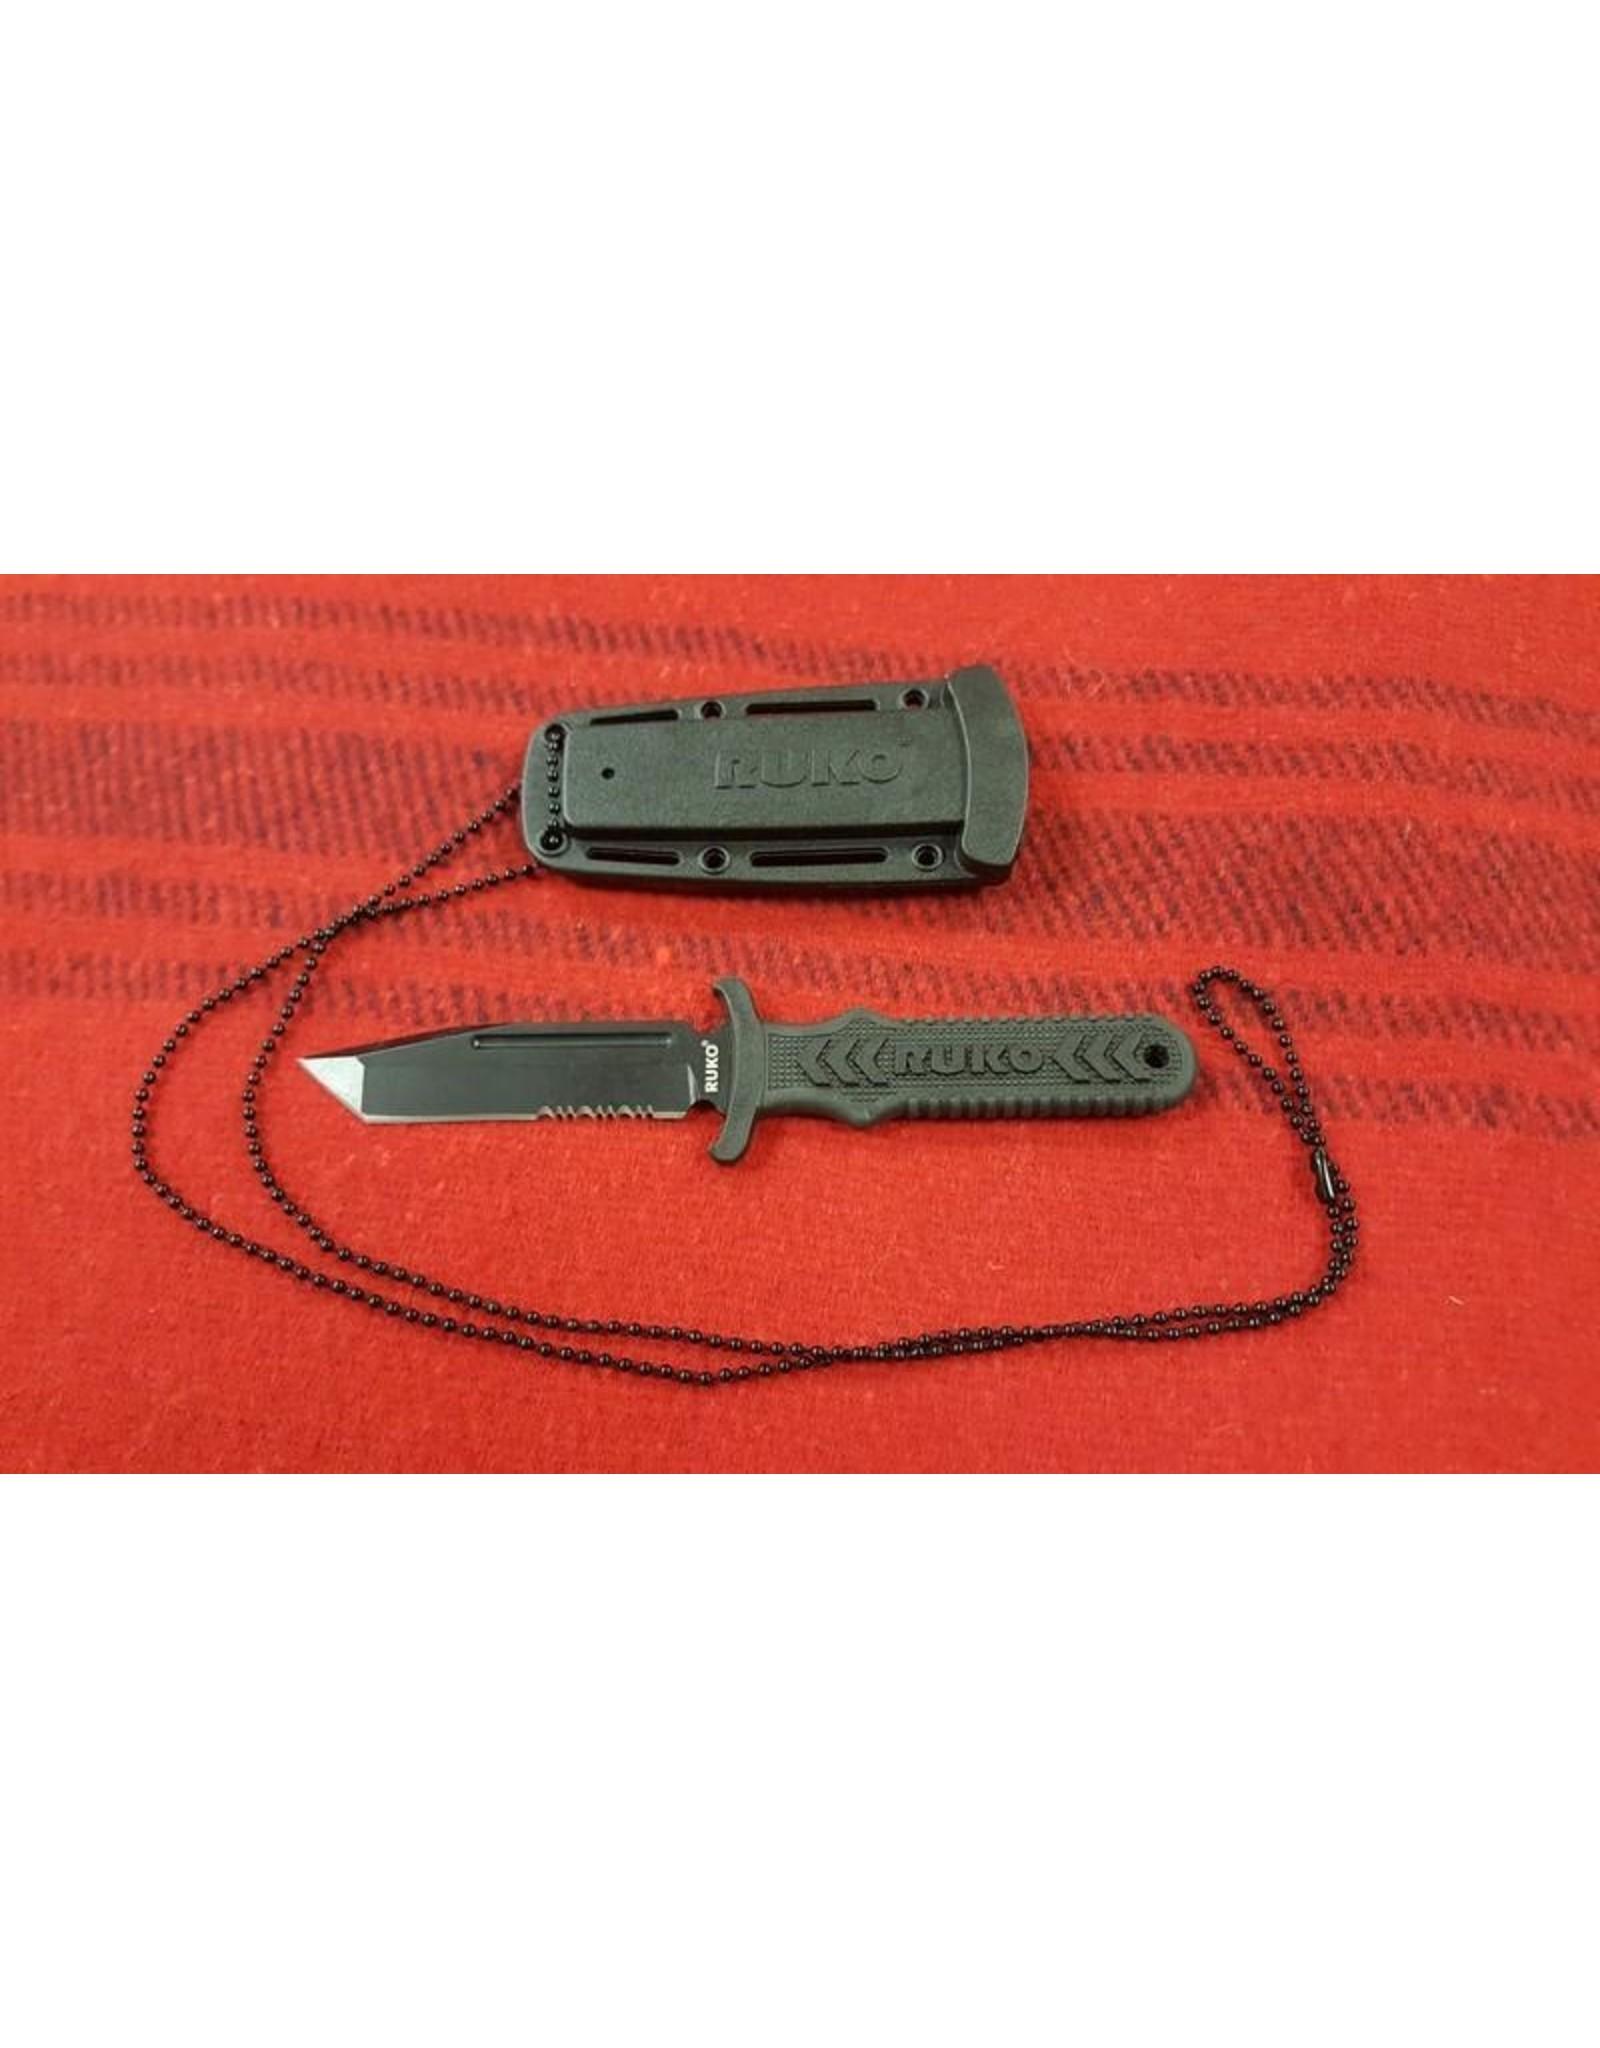 RUKO KNIVES RUKO 0098L TANTO FIXED BLADE BOOT KNIFE